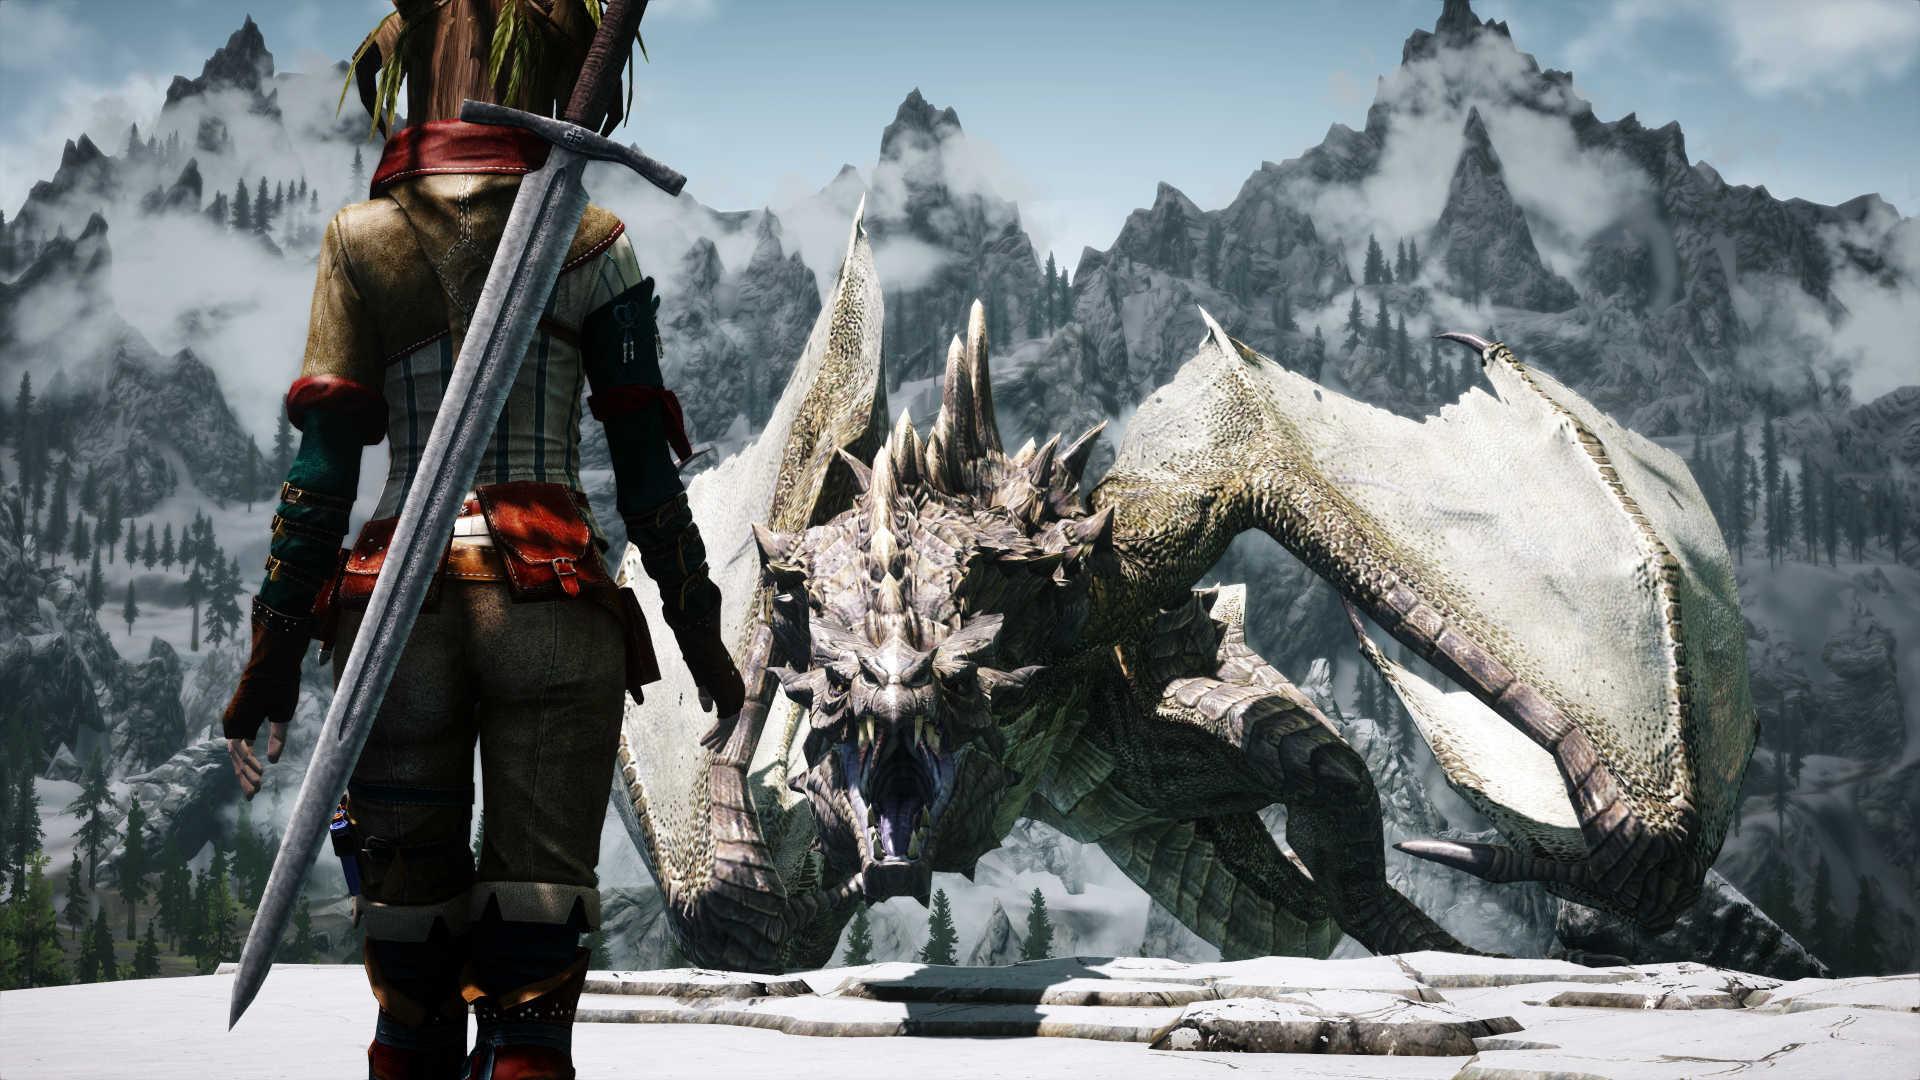 Hd Background Skyrim Dragon Fog Art Game Wallpaper Alduin